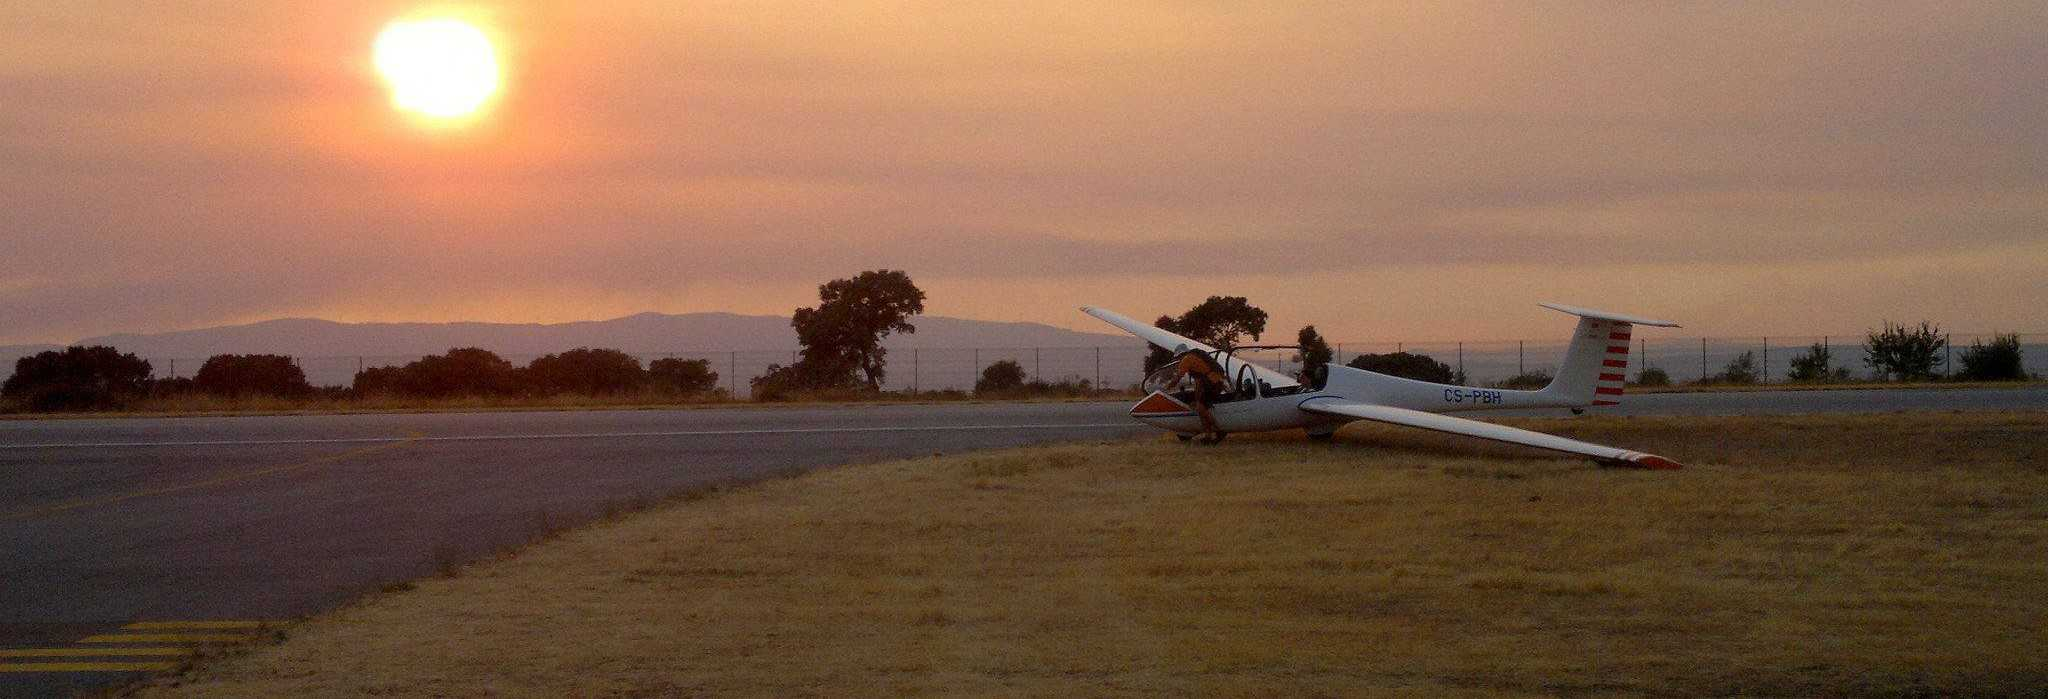 Uso dos Checklist nos planadores